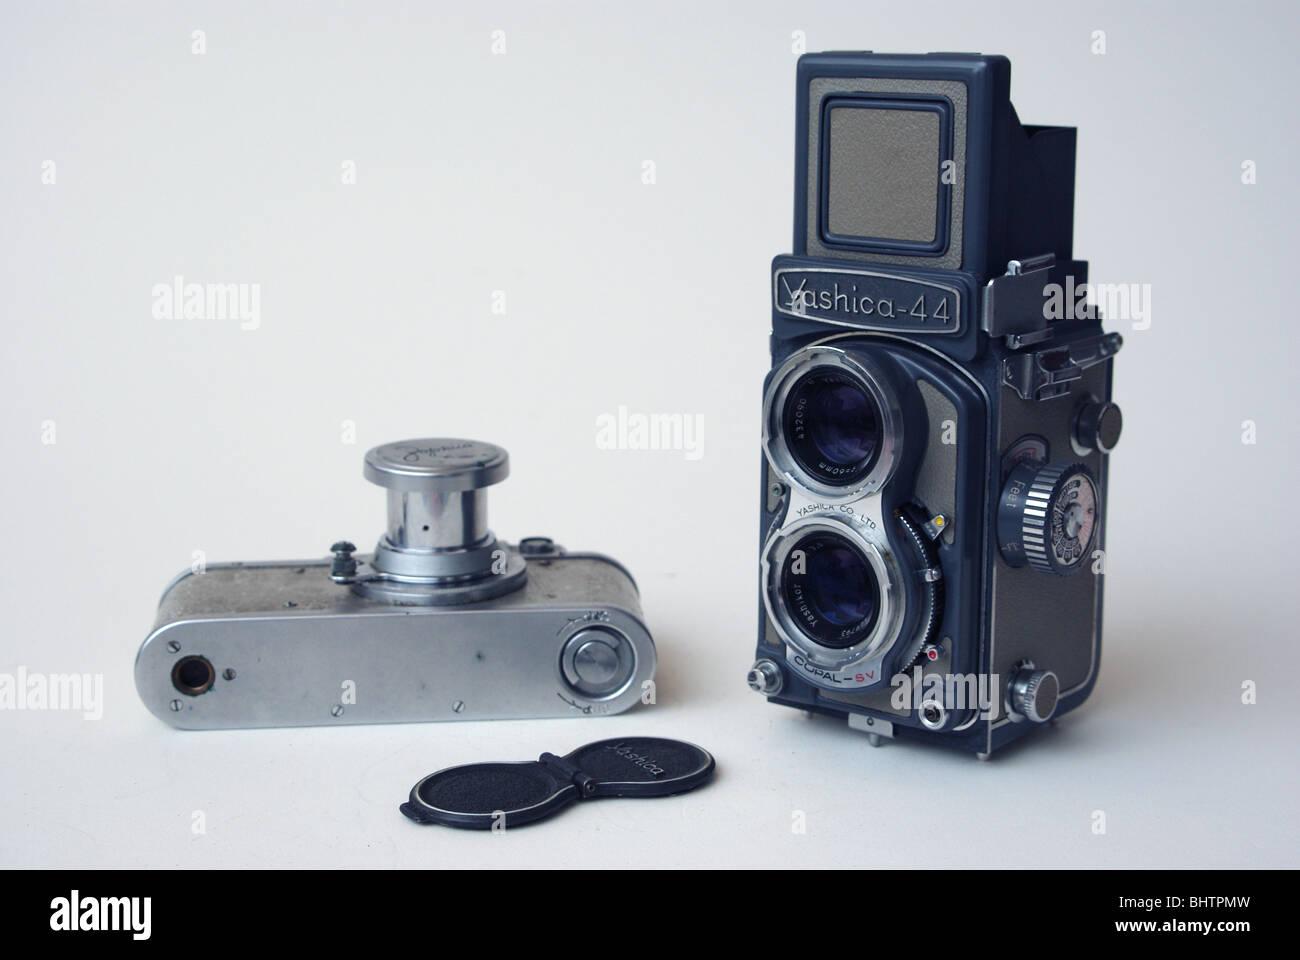 Ricoh Super 44 Twin Lens Reflex / TLR 127 Film Camera | Ideas for ...